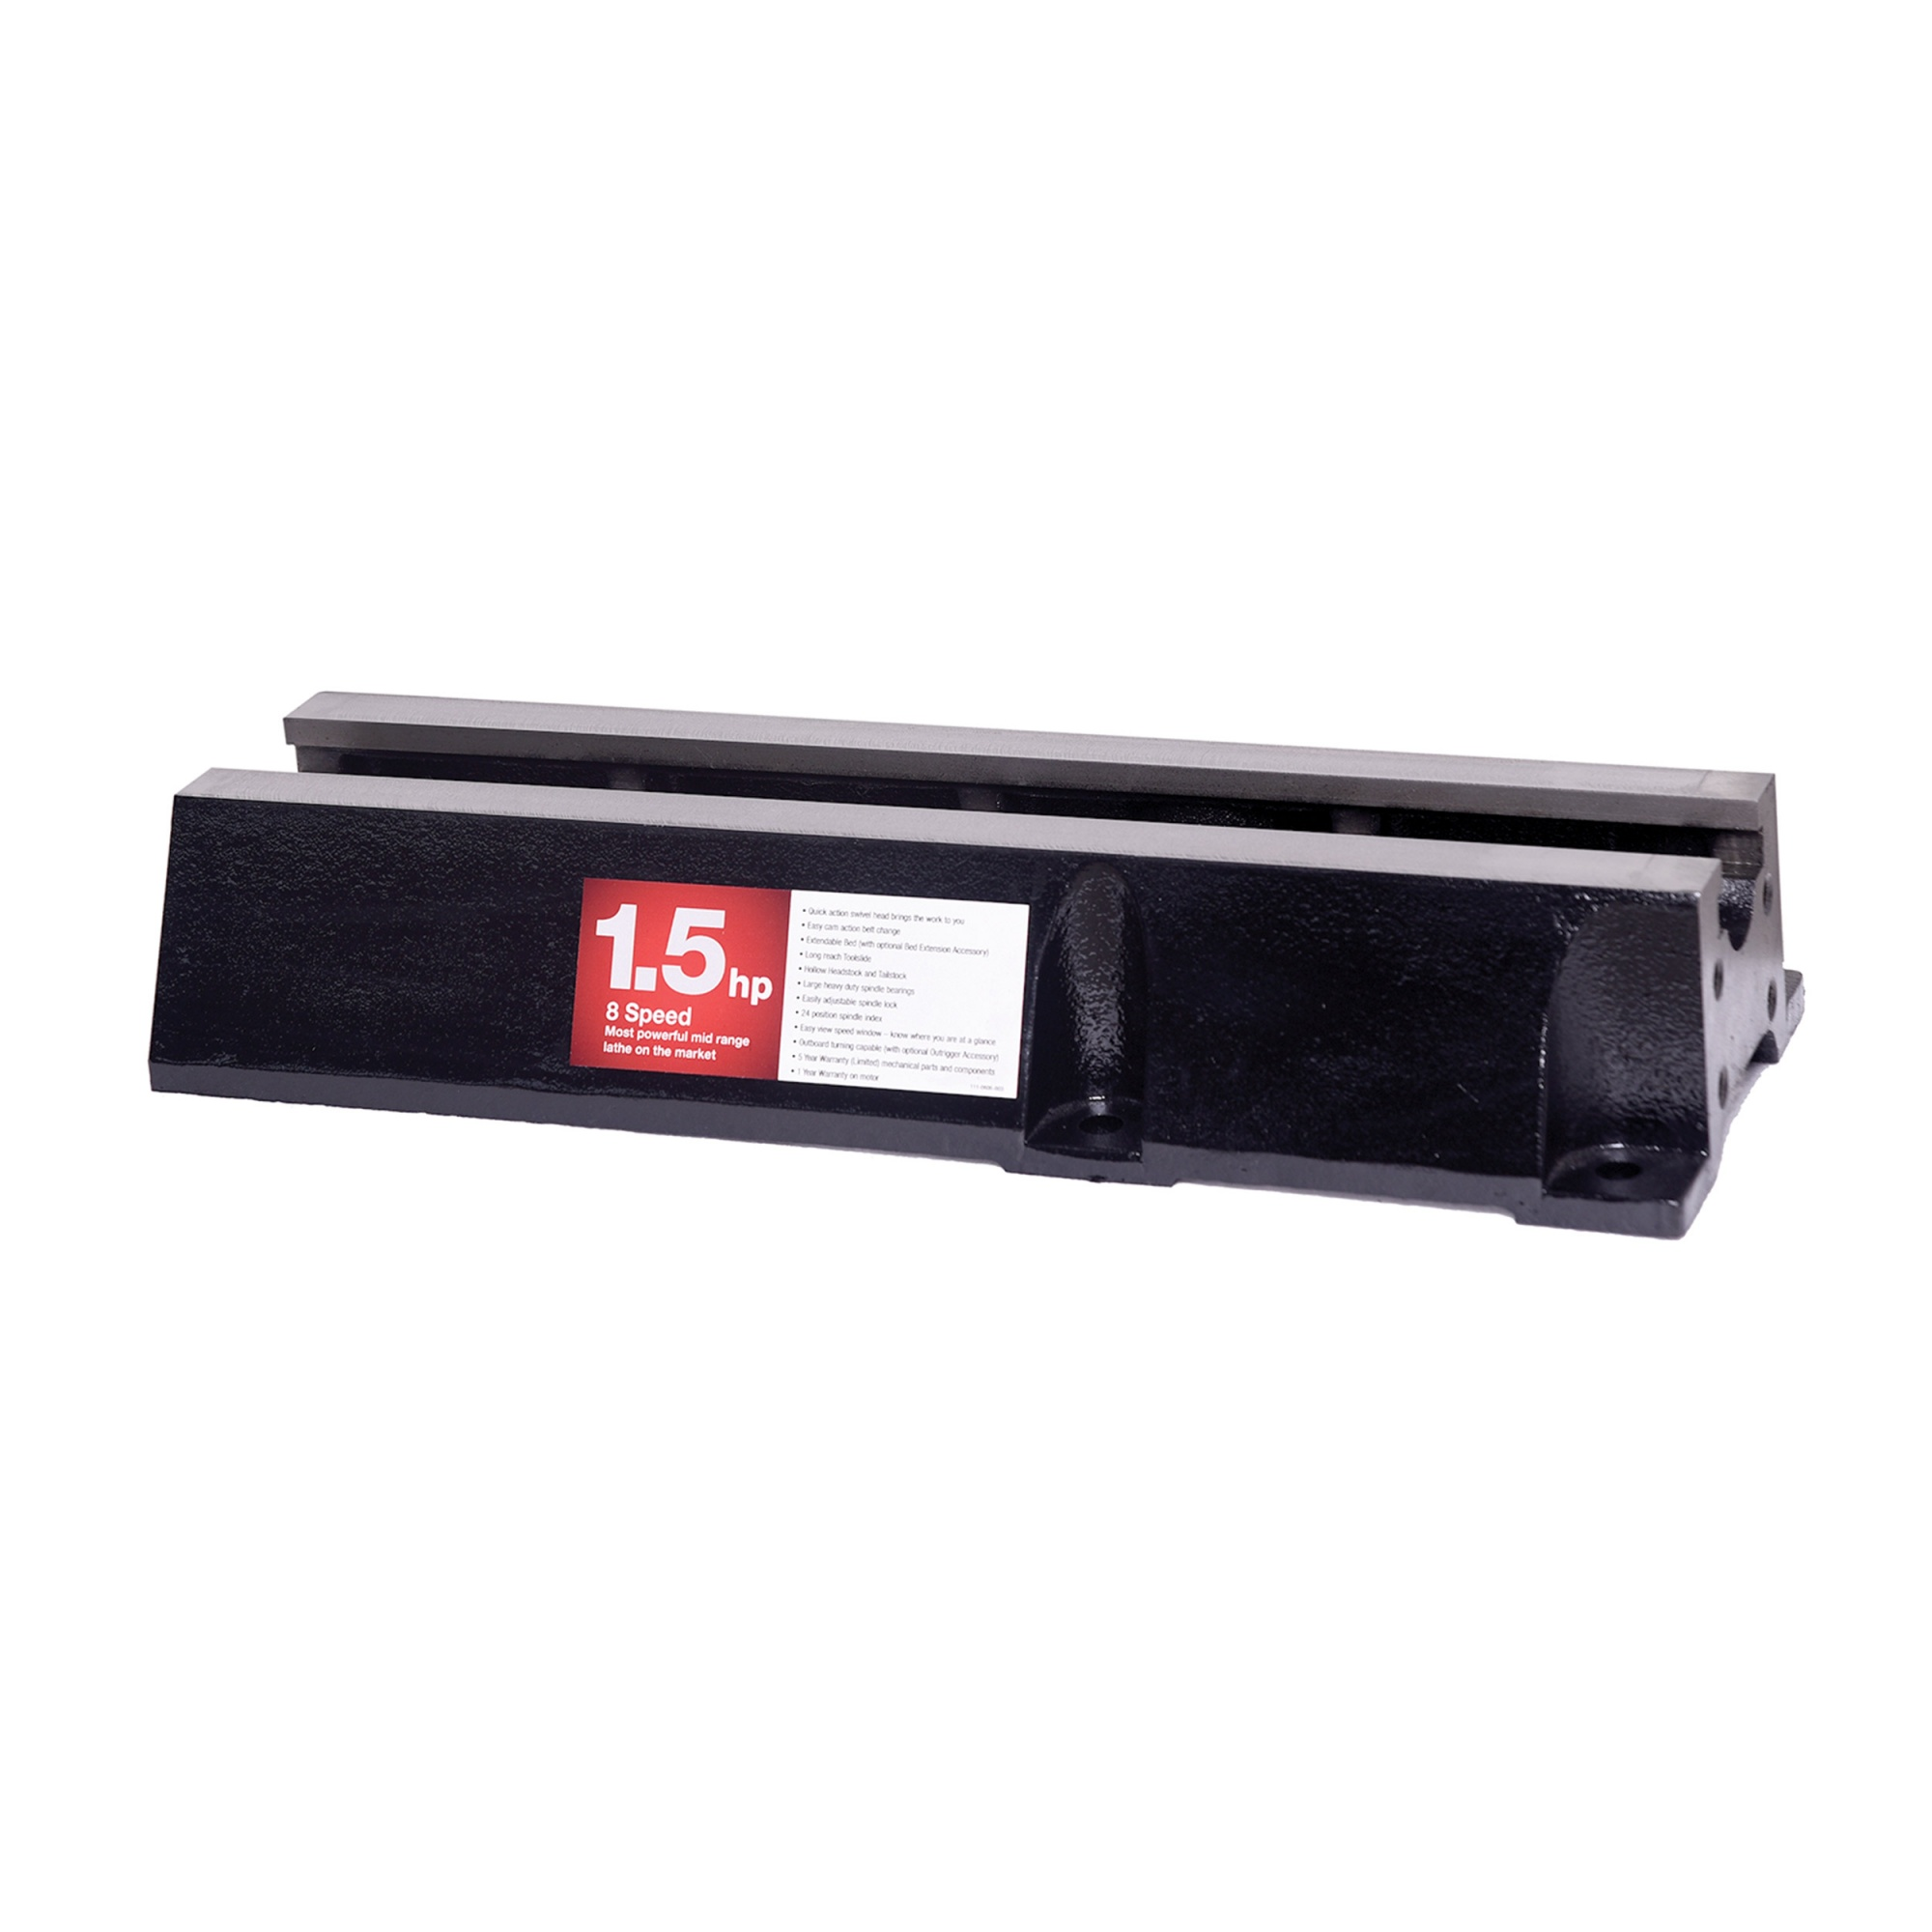 //-20/% RADIAL 16x26mm ROHS CAPACITOR 60 MERITEK RB35V222M16X26 35V 2200uF 85°C